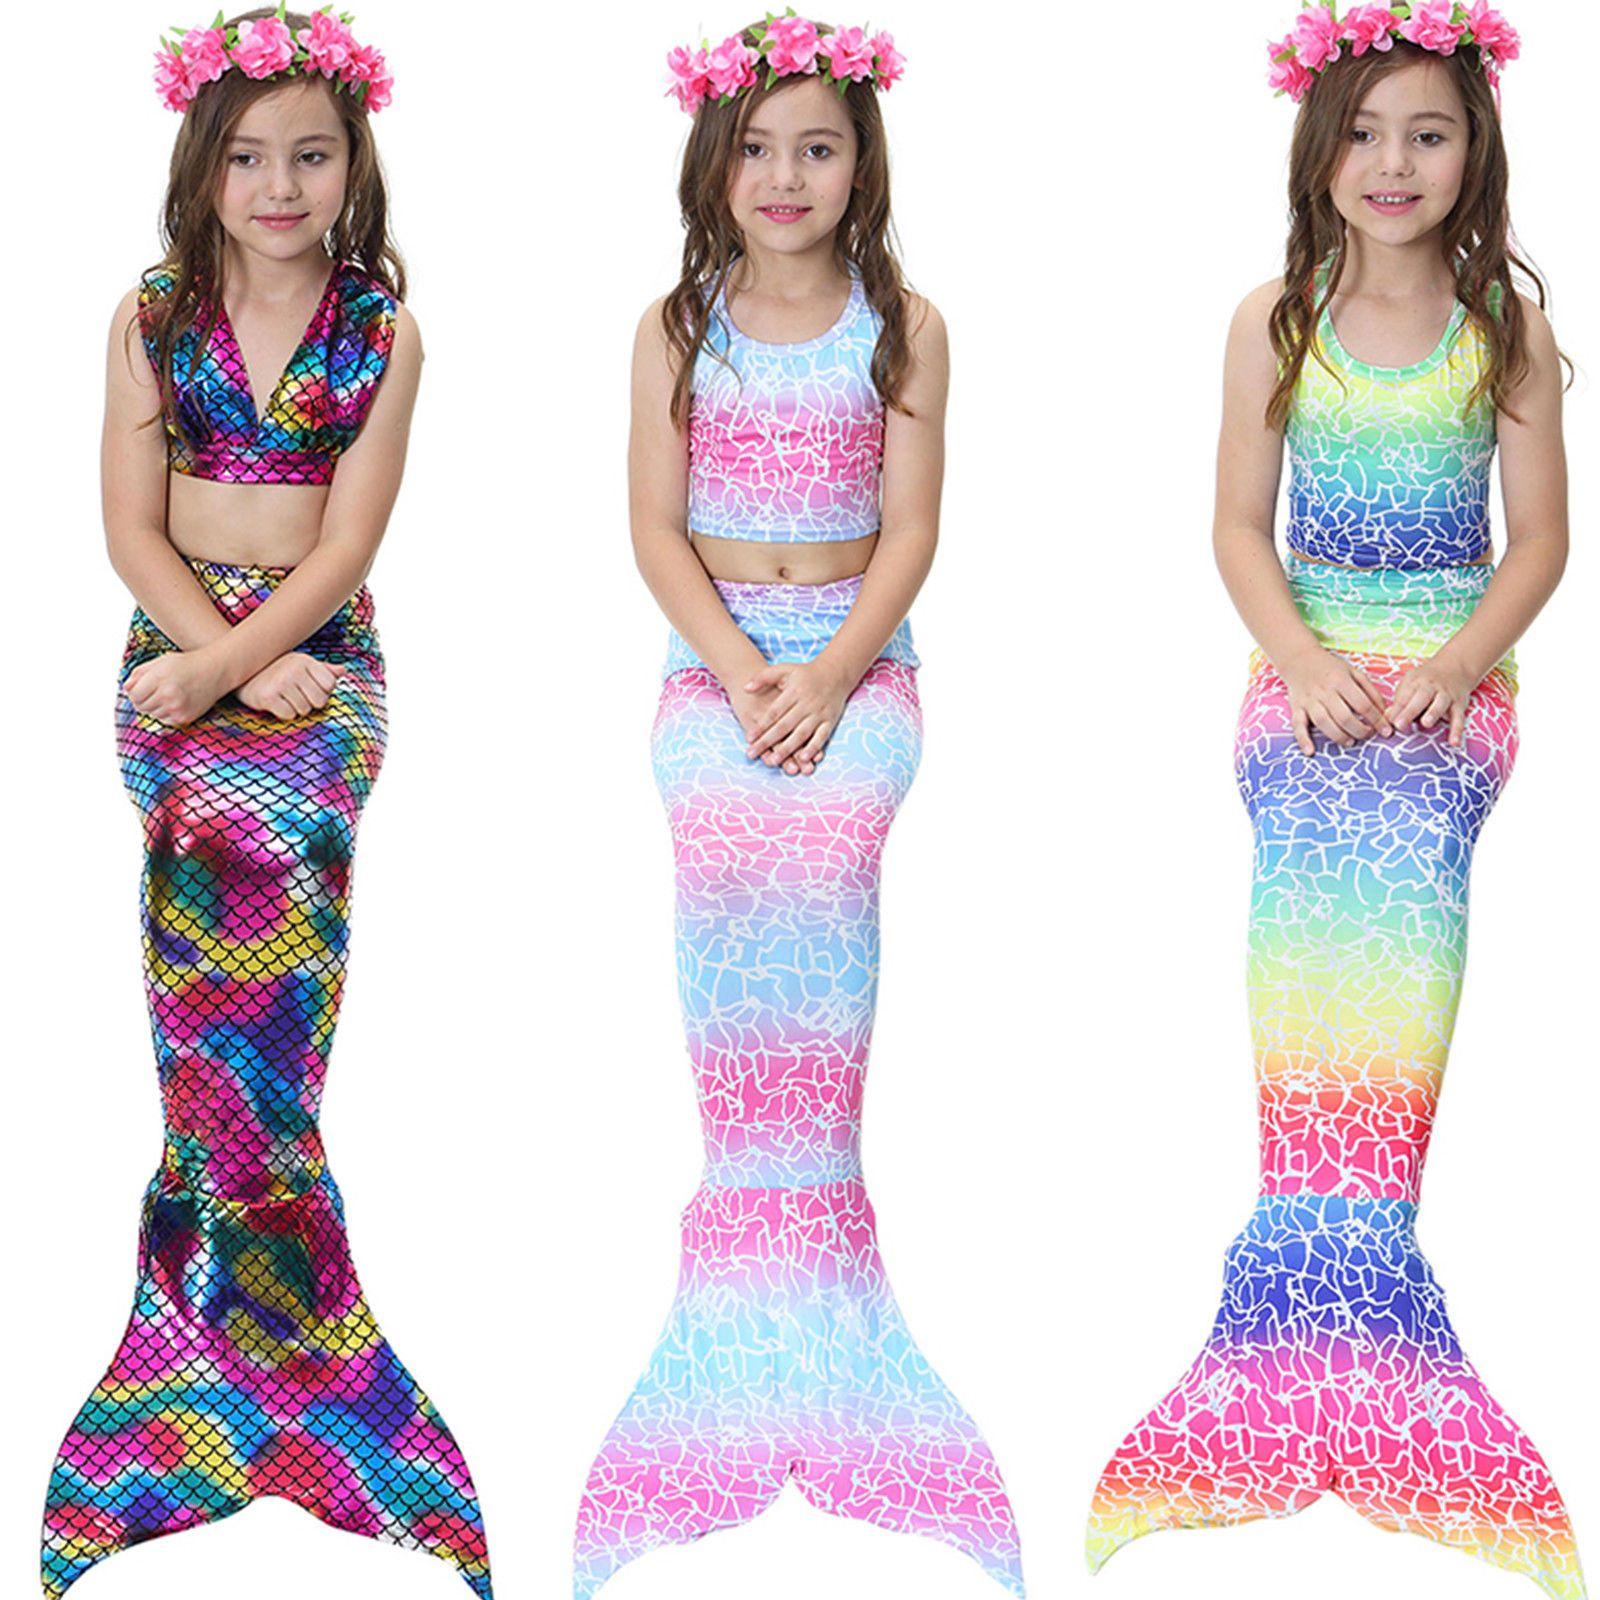 Crianças Meninas 3 Pcs Sereia Cauda Natação Bikini Set Swimwear Mono Fin Swimmable